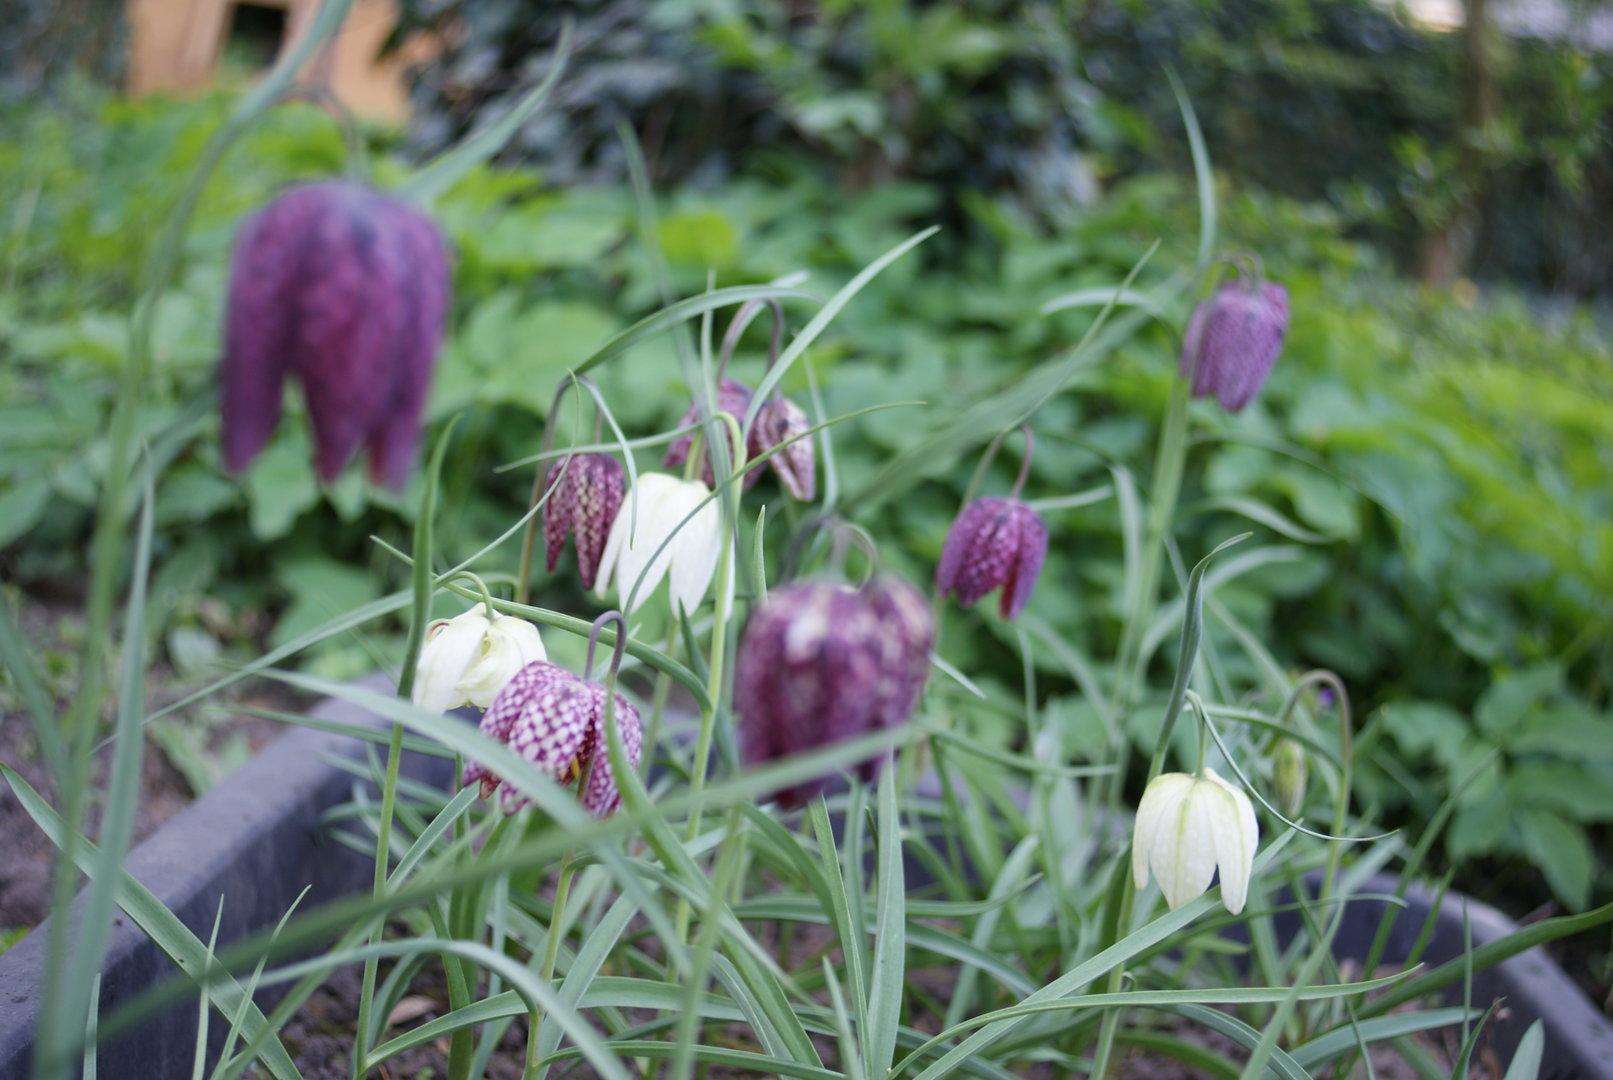 20 x Knollen Schachbrettblume Fritillaria Meleagris Kiebitzei Weiß ...